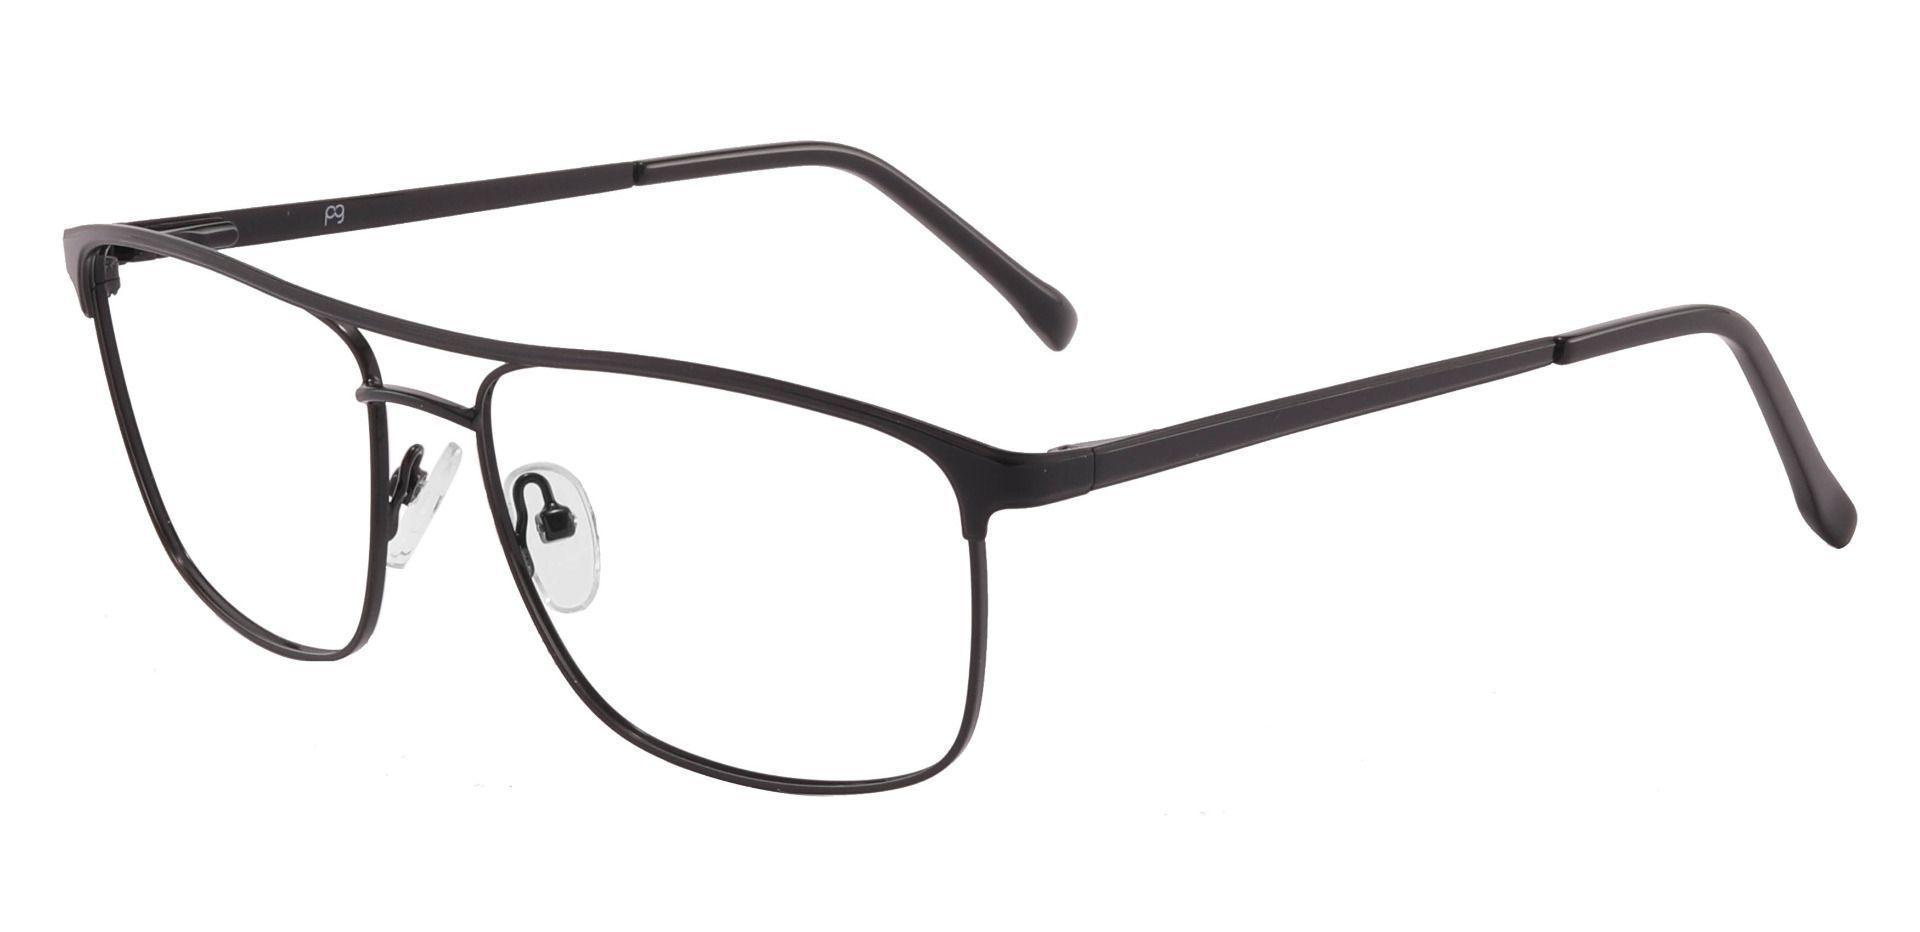 Darren Aviator Prescription Glasses - Black